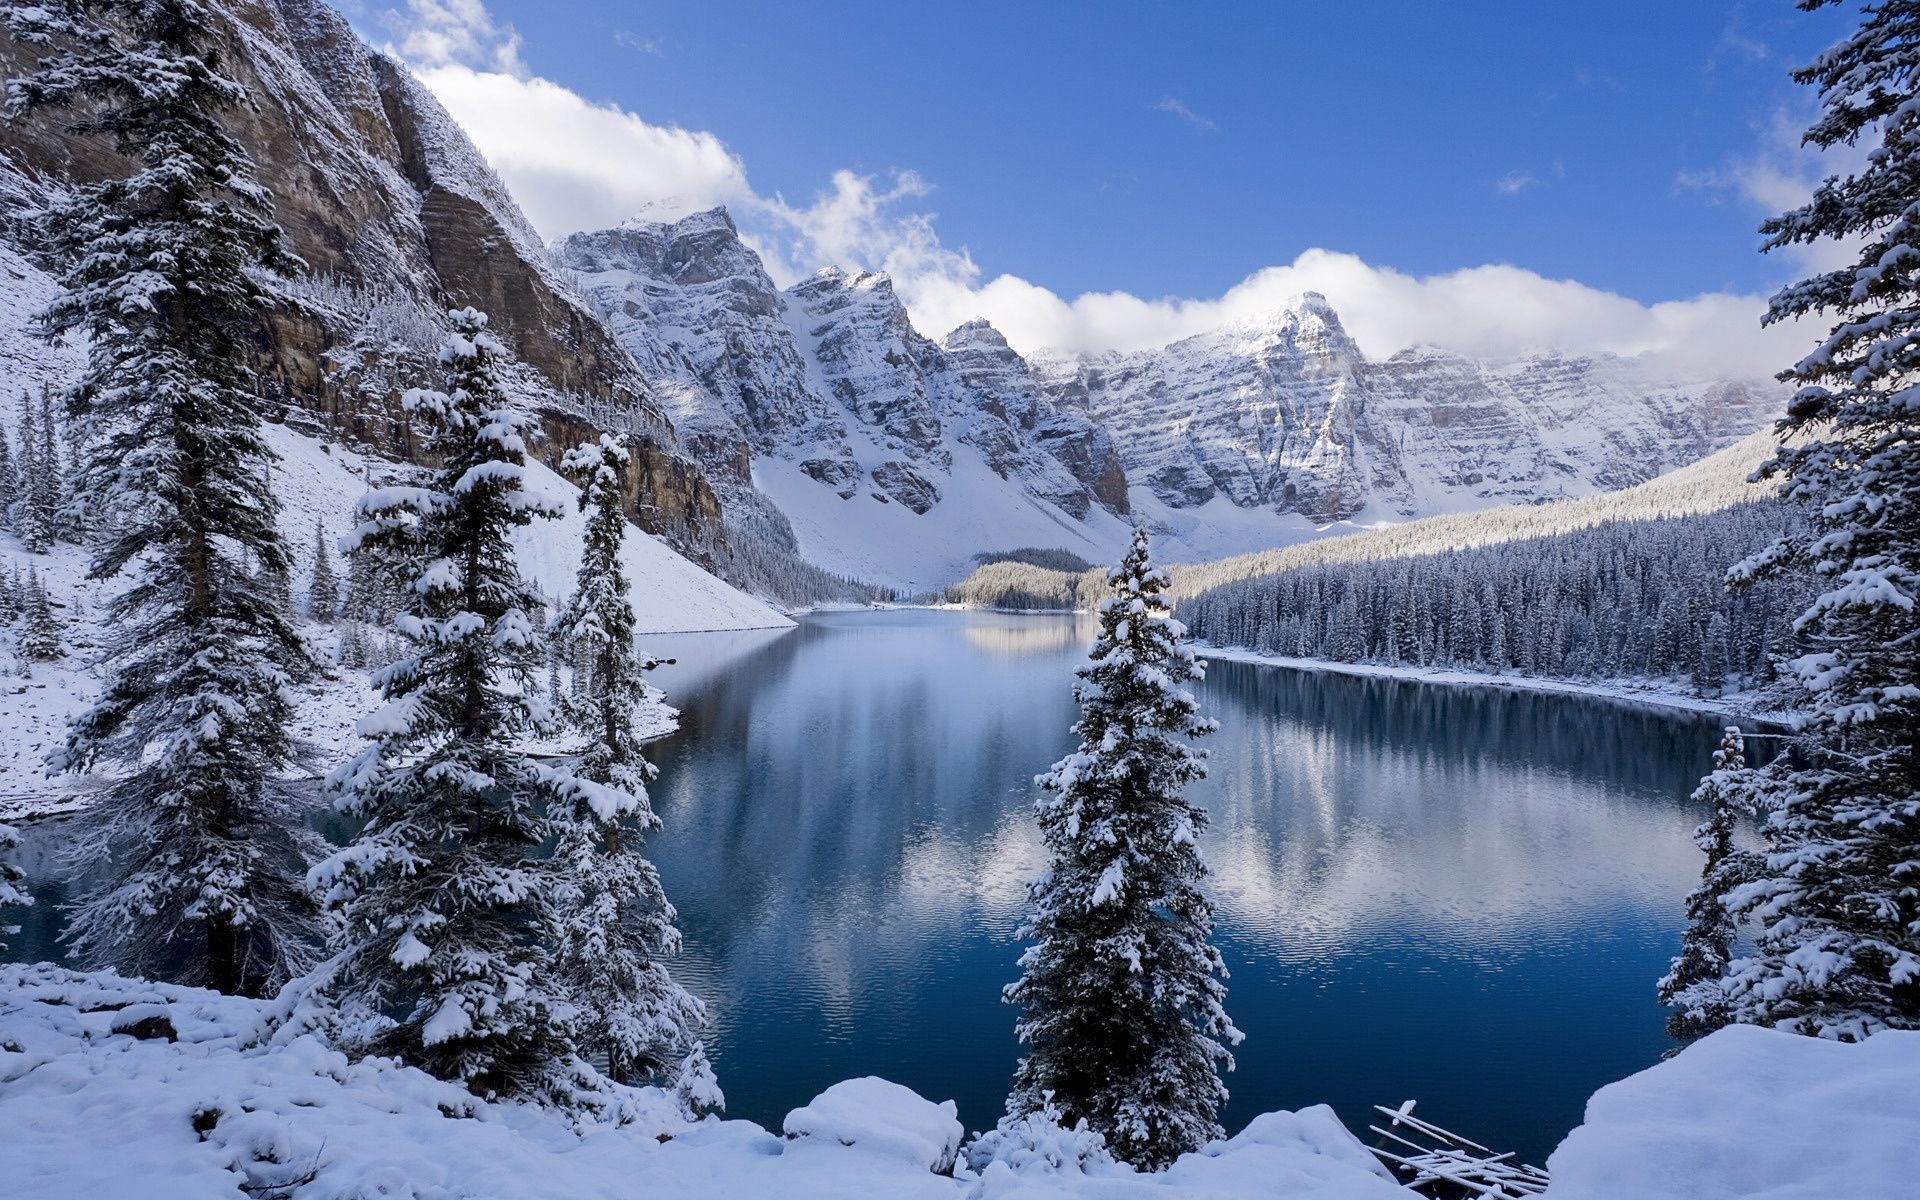 Wallpaper forest, winter, snow, lake, mountains desktop wallpaper .